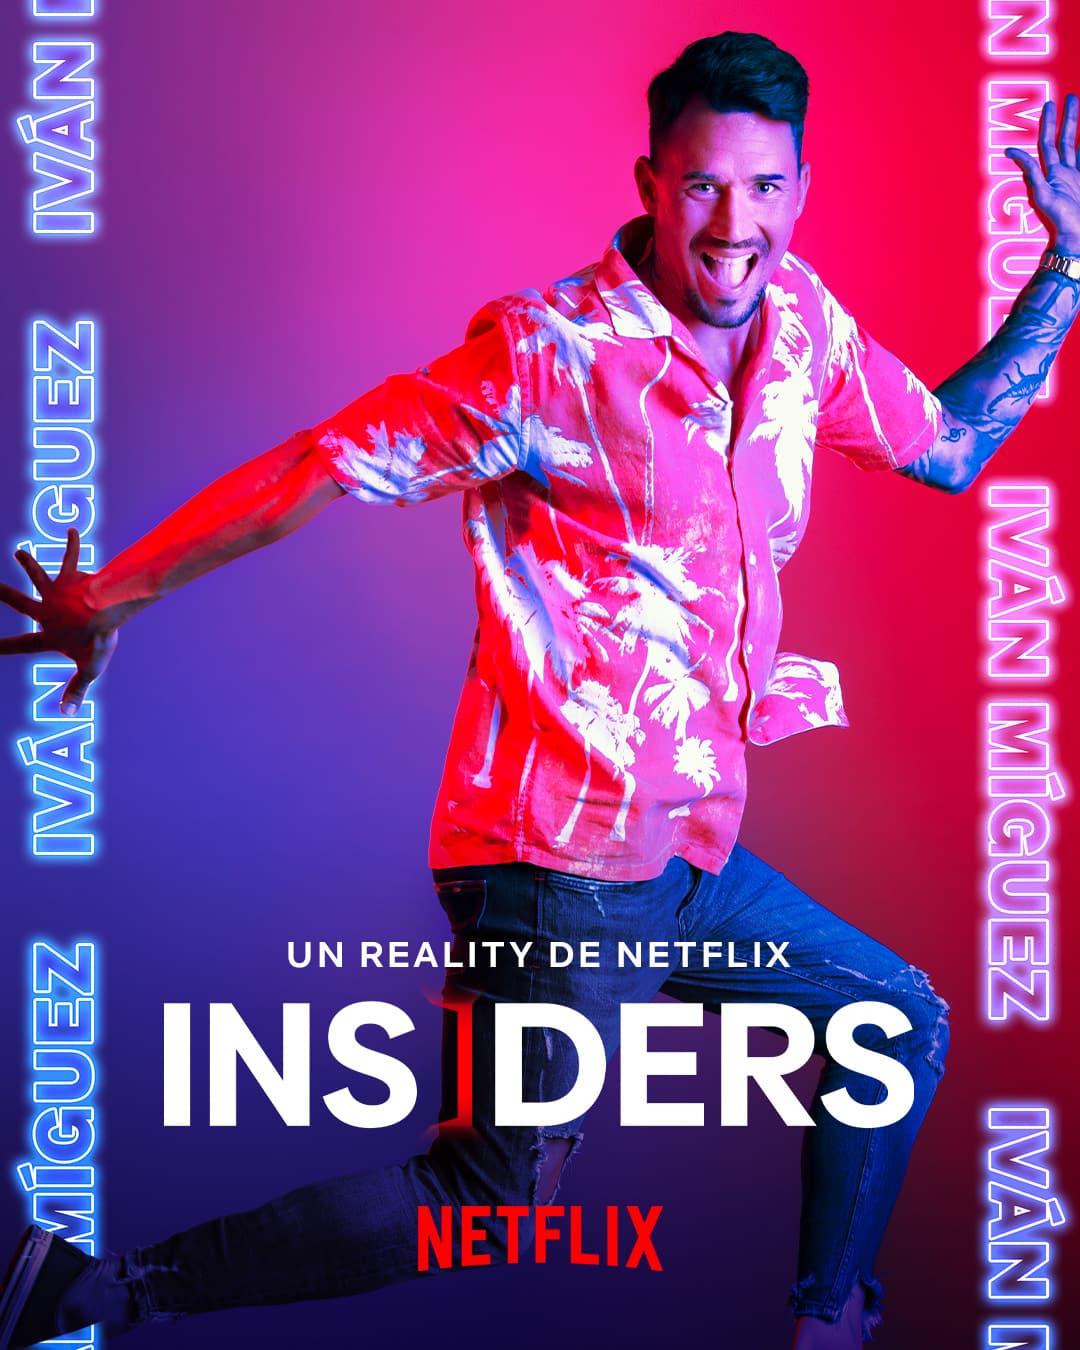 Iván Míguez (33), 'Insiders'